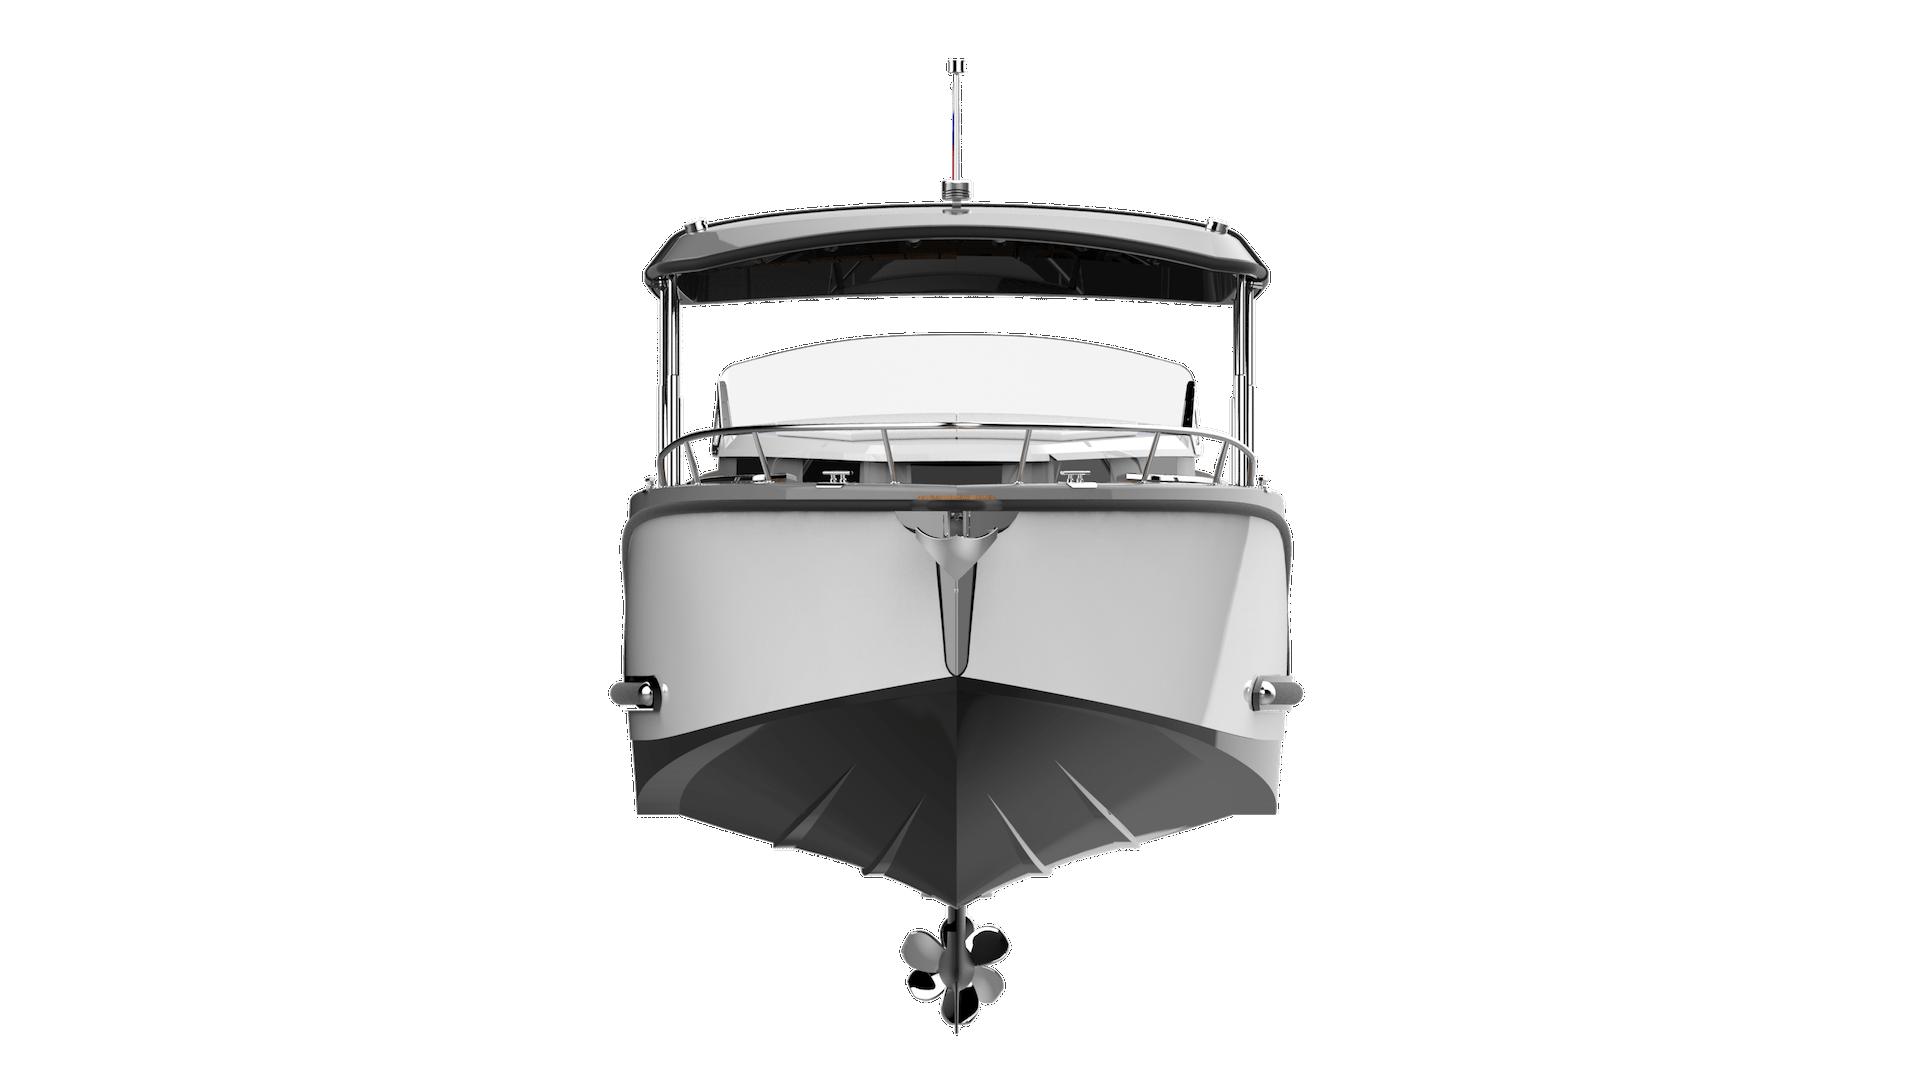 Motorboot yacht hersteller